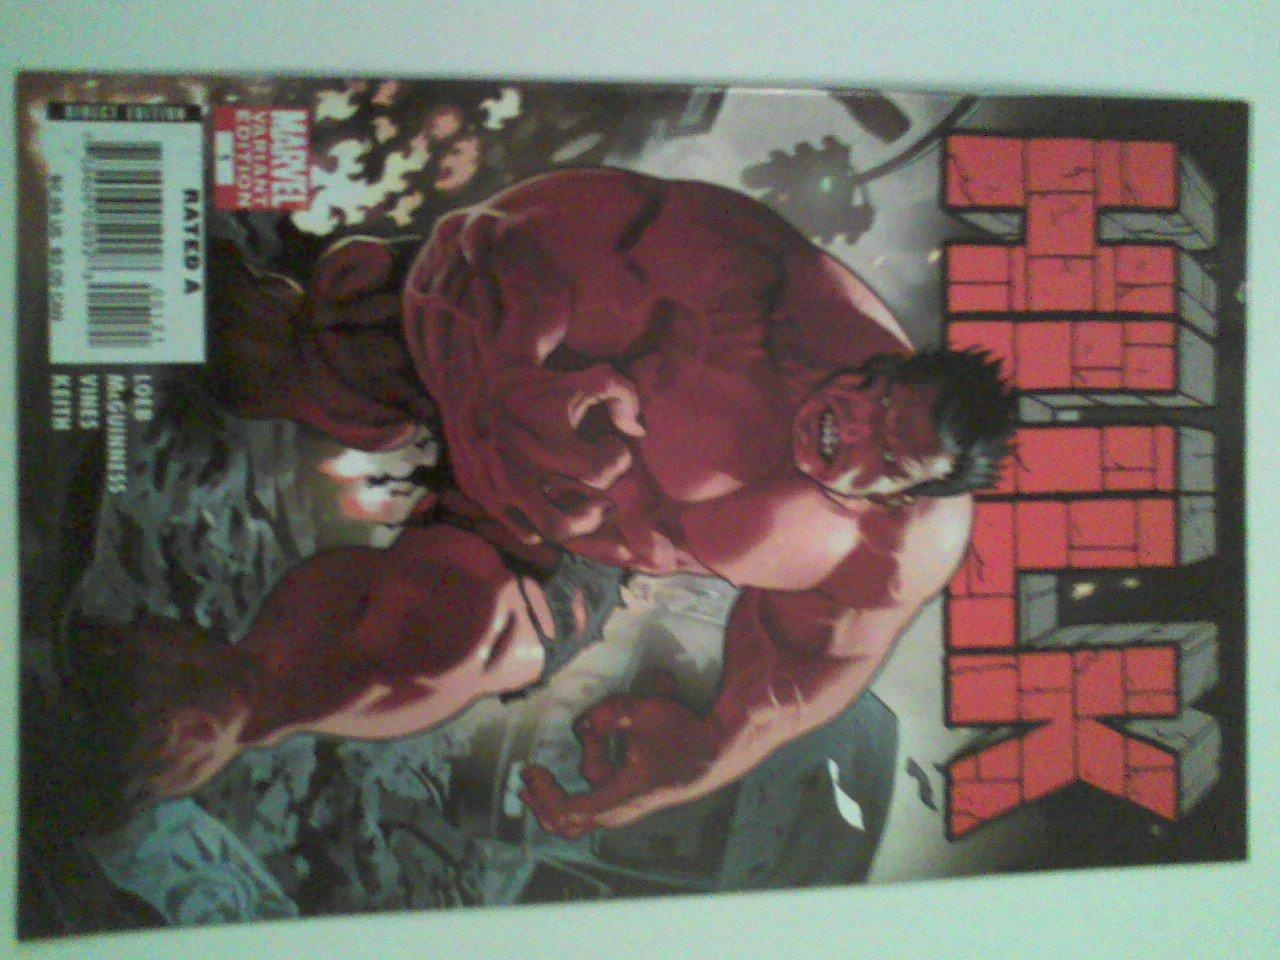 Hulk Vol 2 #1 Incentive Cover 1st cameo Red hulk